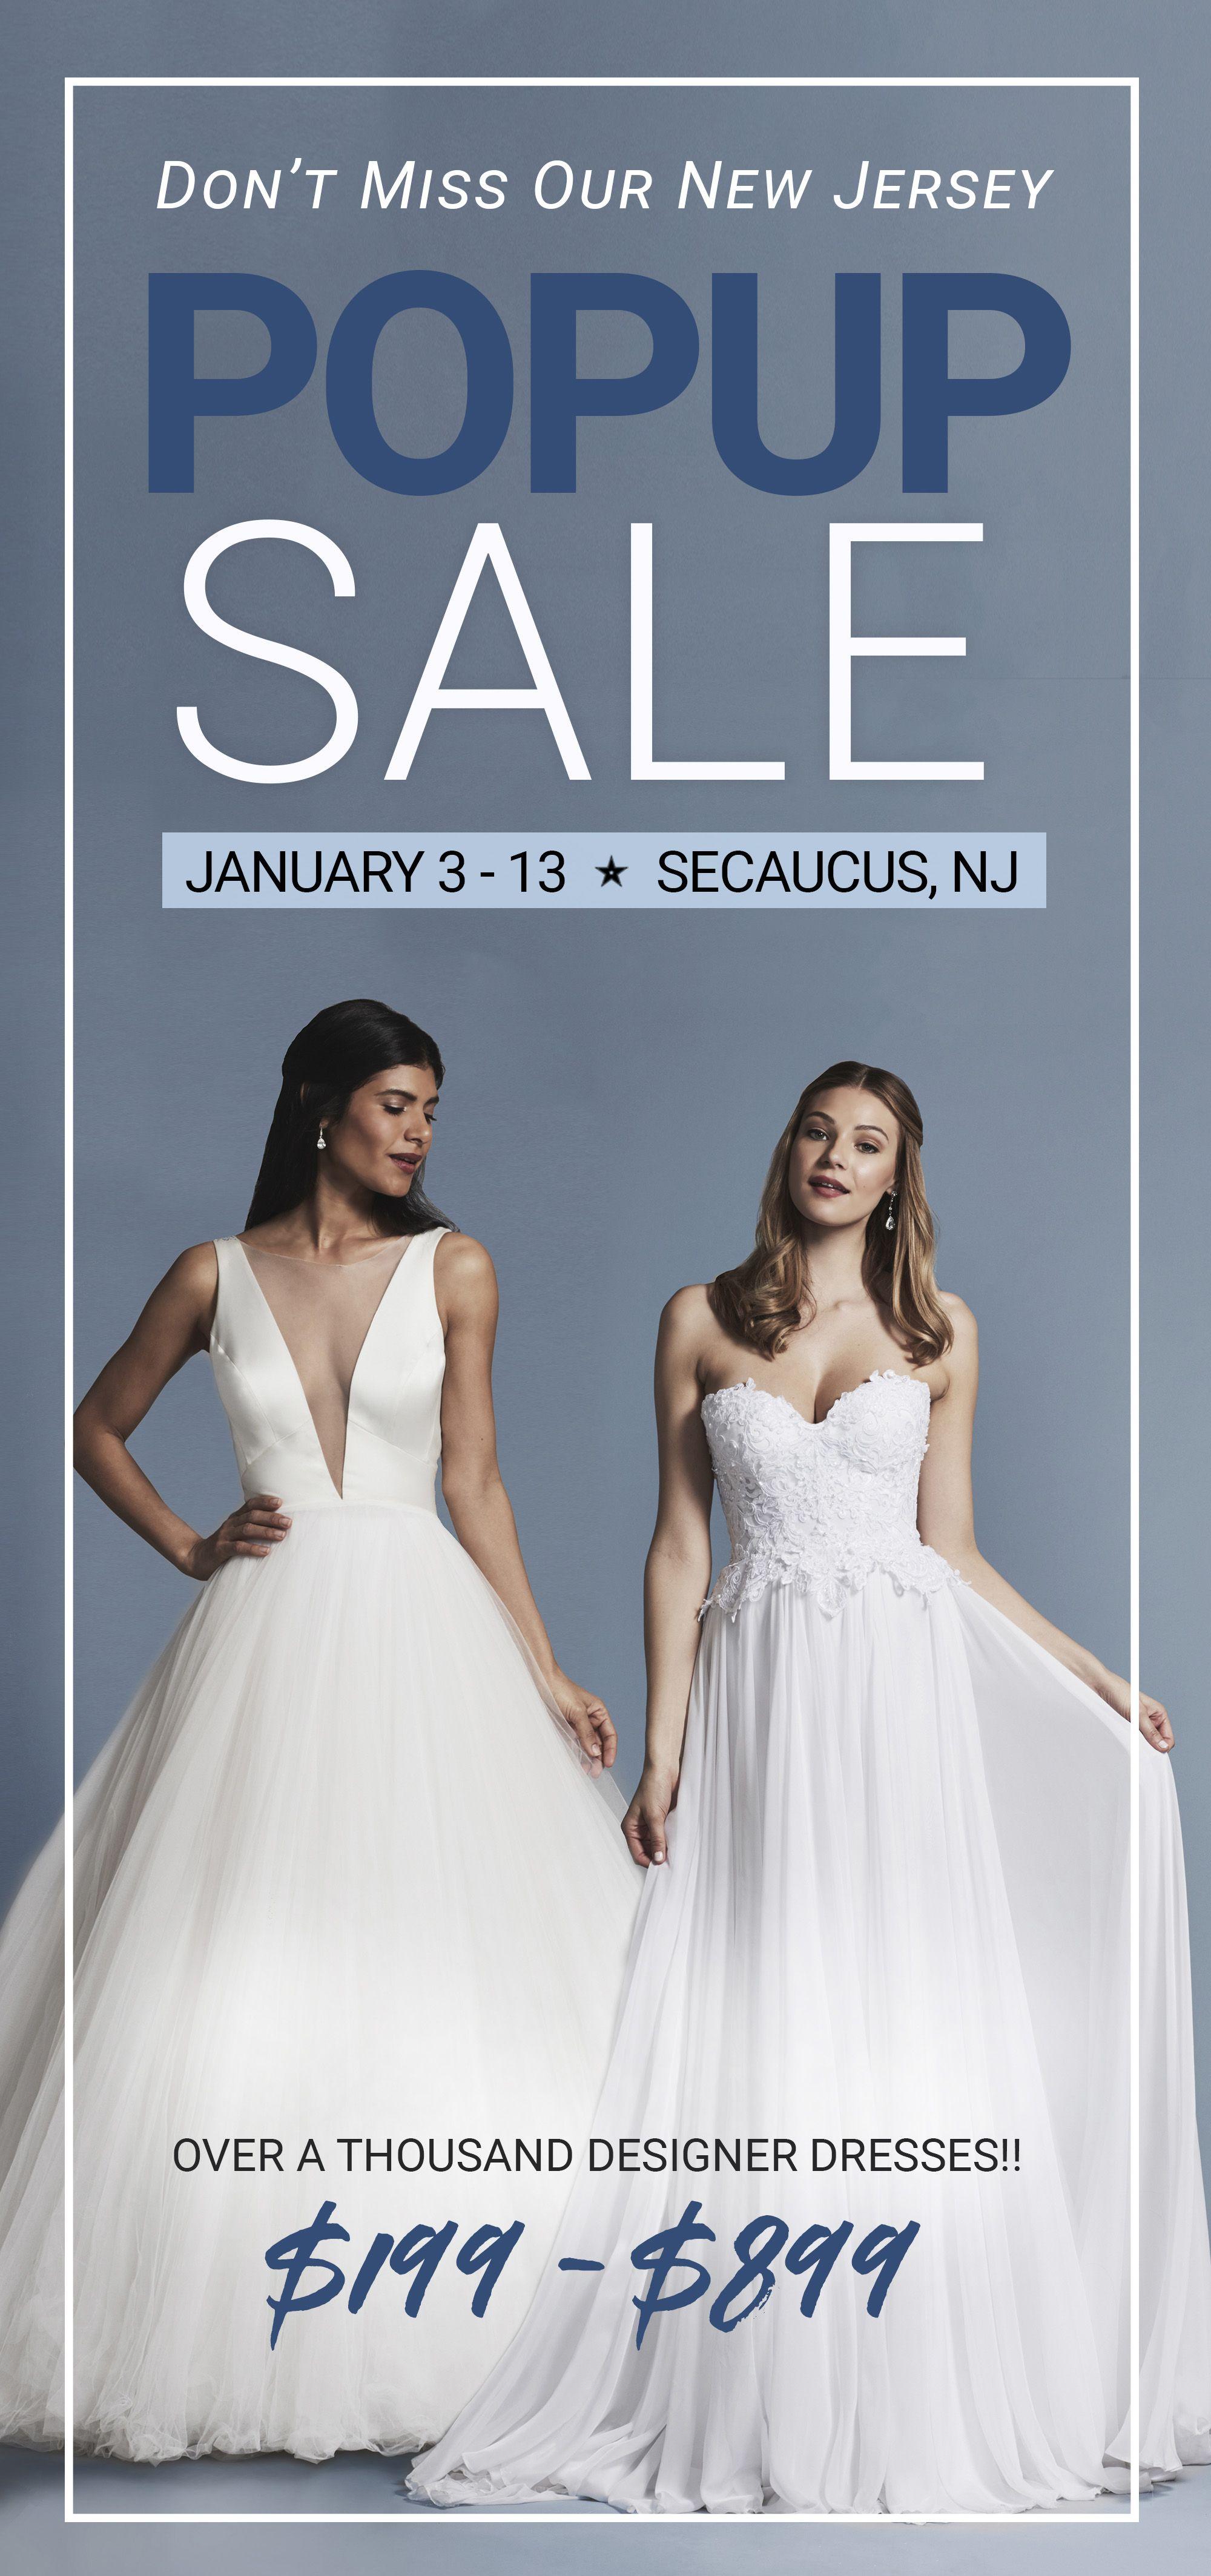 Wedding Dress Sale In Secaucus New Jersey Wedding Dresses For Sale Kleinfeld Bridal Wedding Dresses